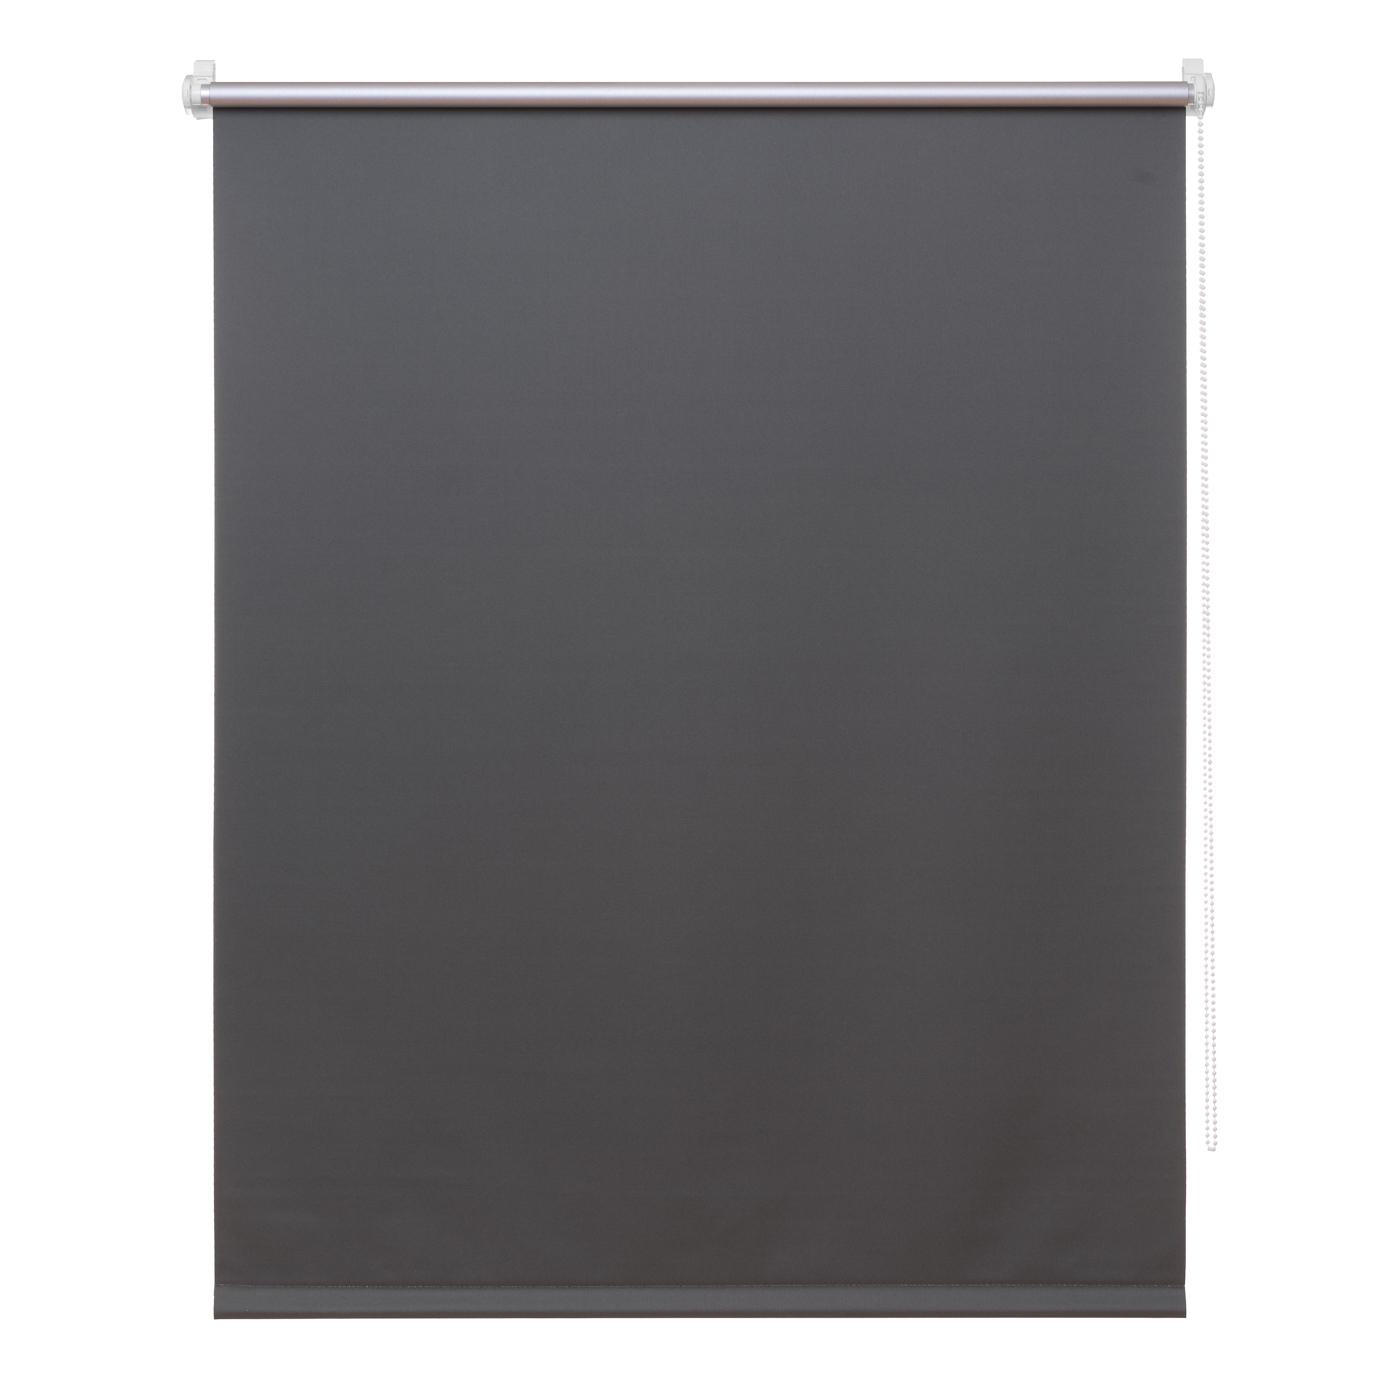 verdunkelungsrollo ohne bohren rollo klemmfix thermorollo klemmtr ger grau ebay. Black Bedroom Furniture Sets. Home Design Ideas